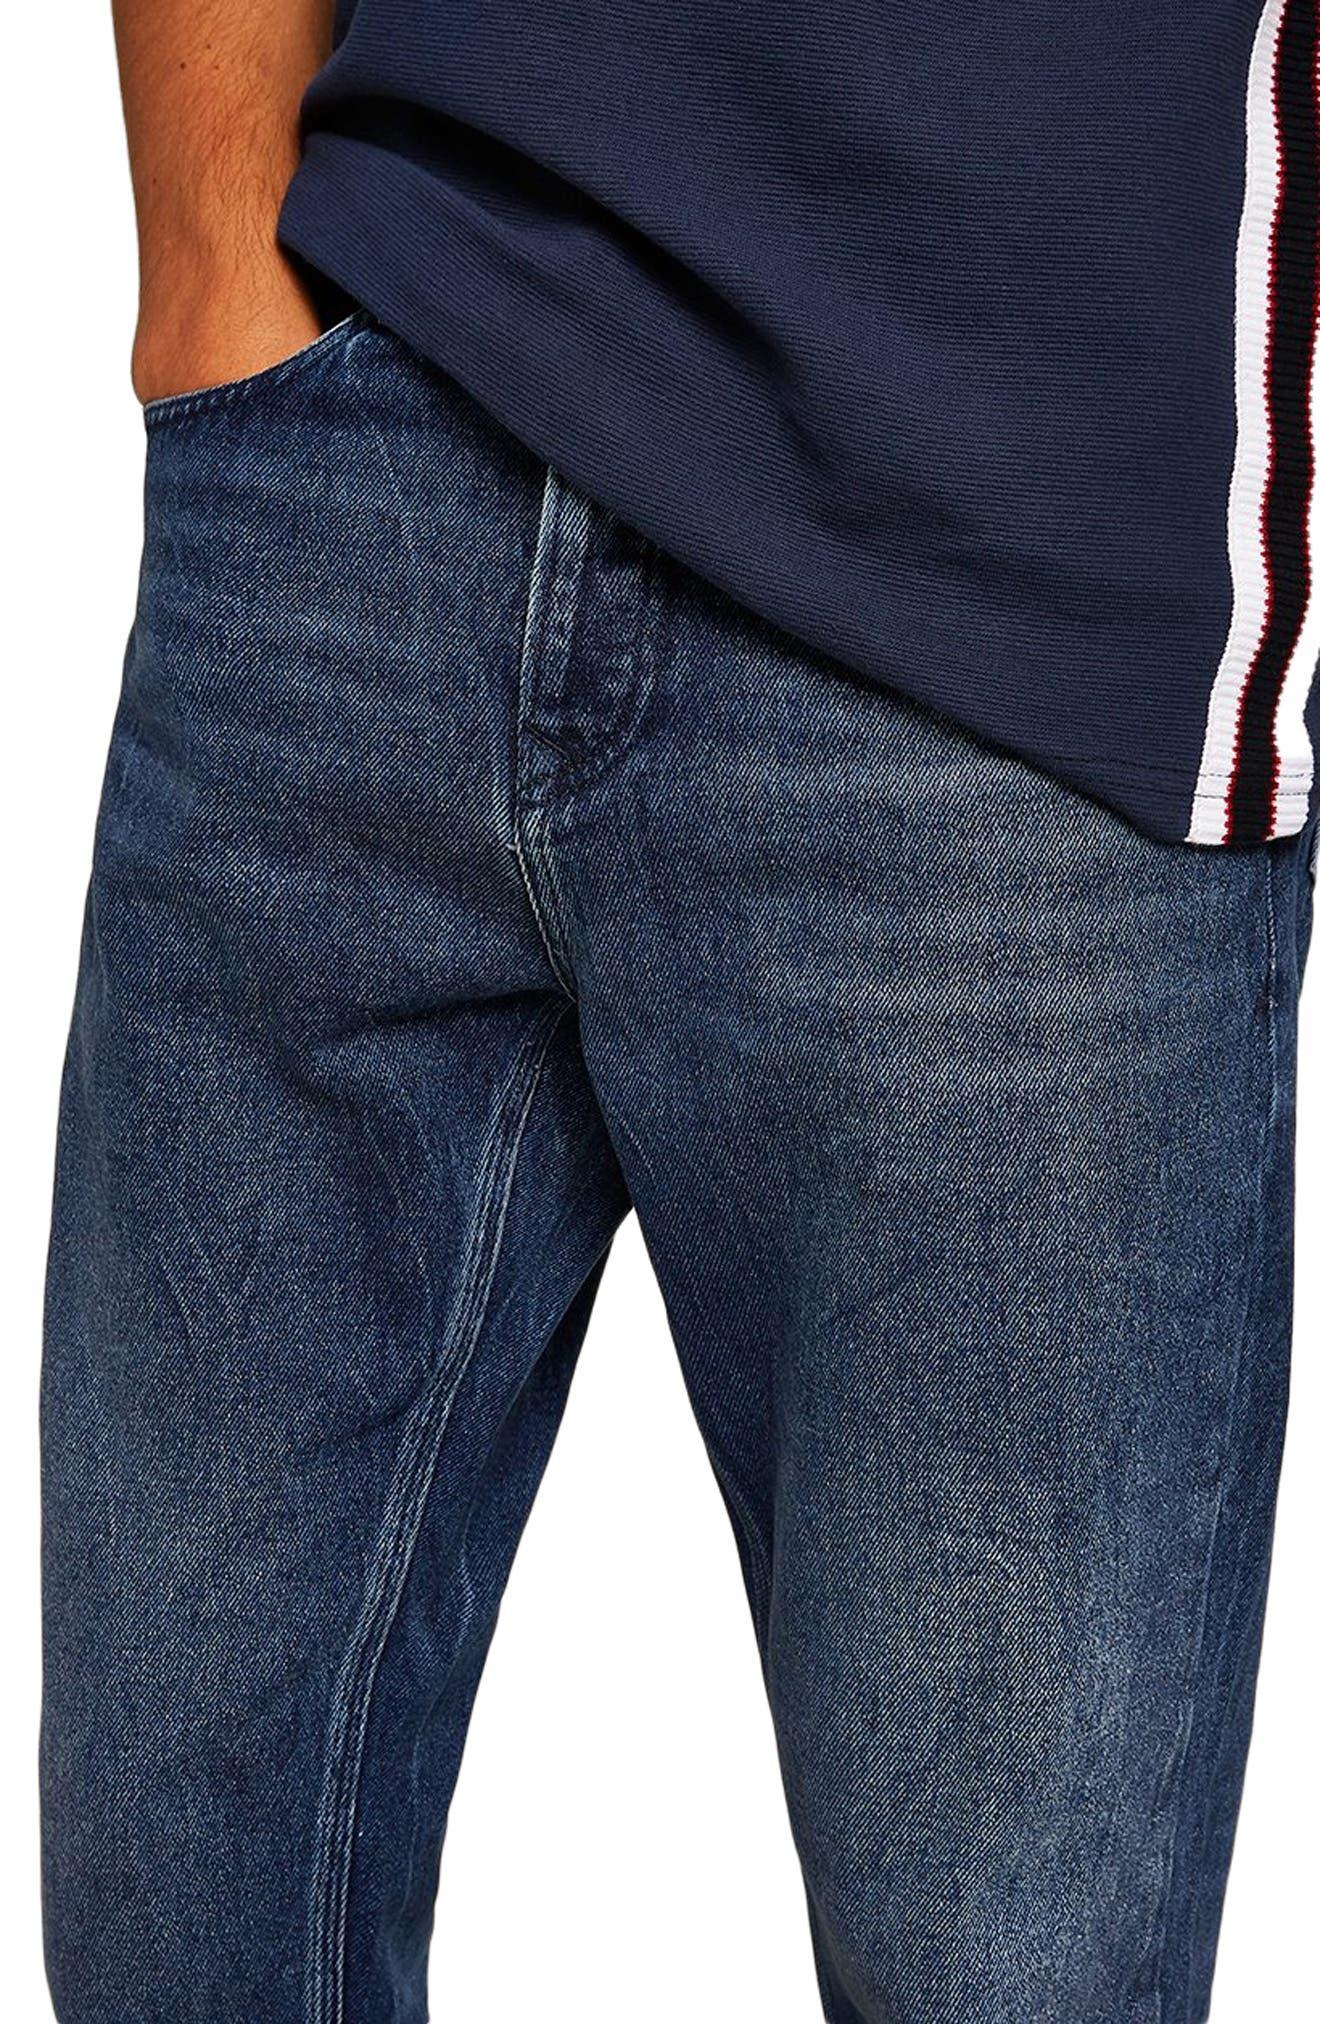 Cupid Rigid Taper Jeans,                             Alternate thumbnail 3, color,                             DARK BLUE